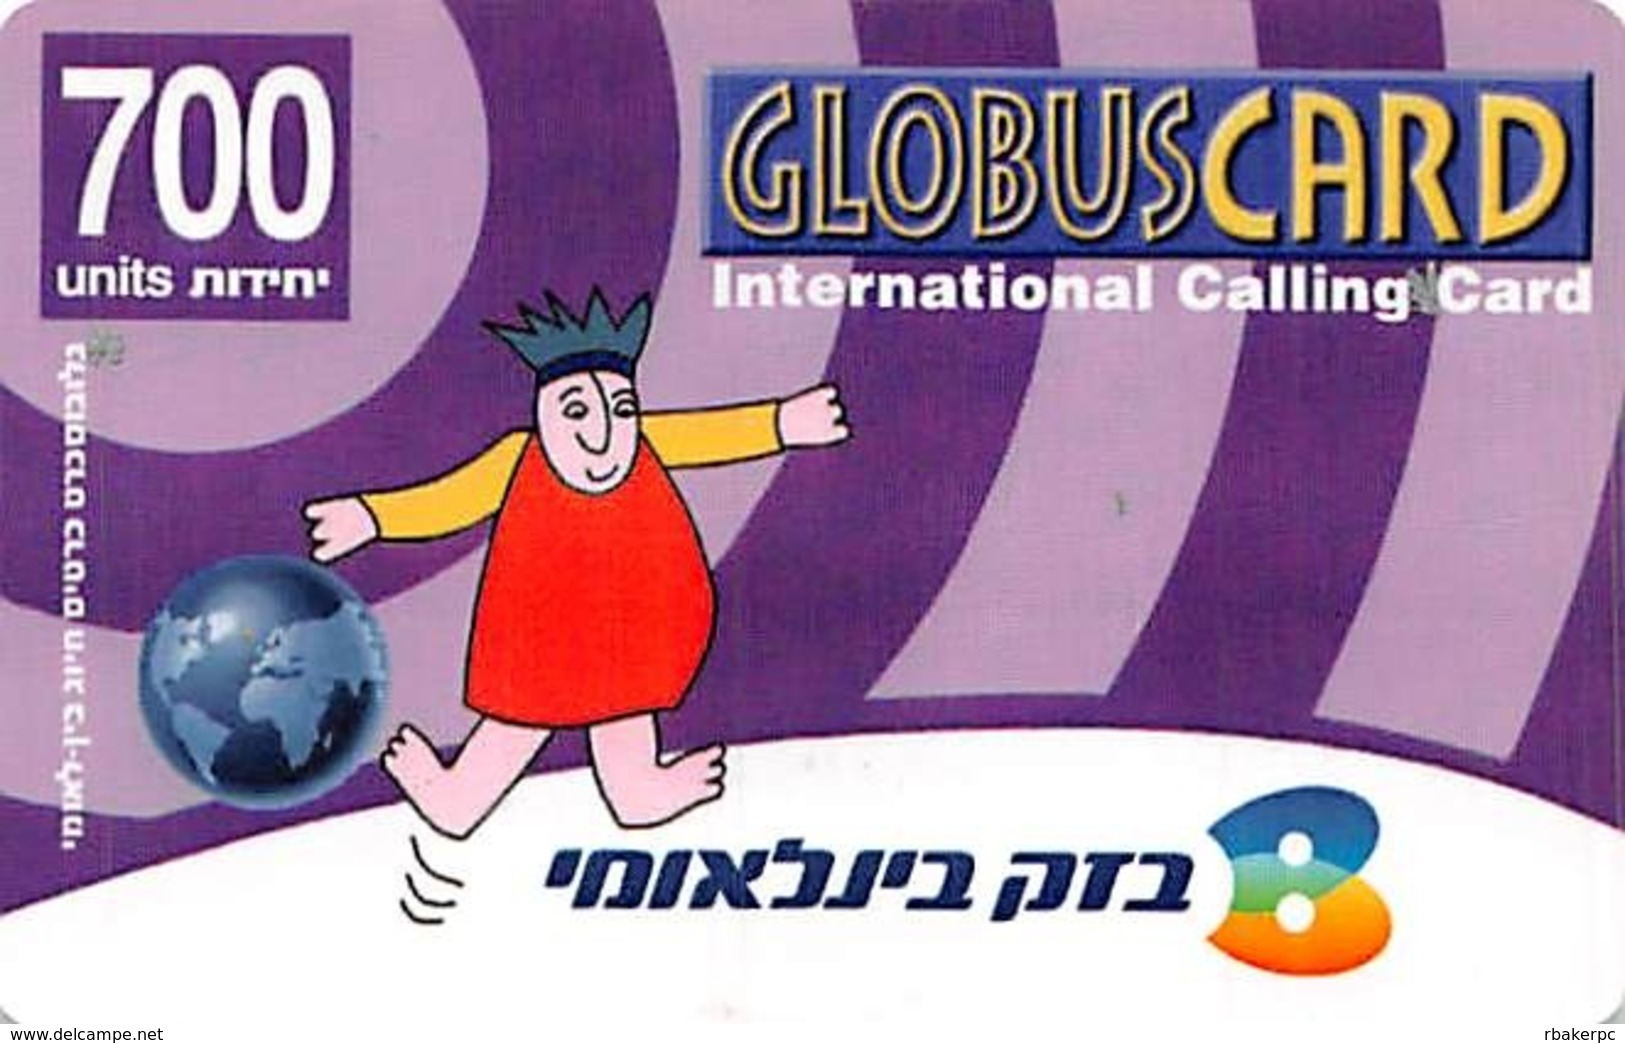 Globus Card International Calling Card - Phonecards